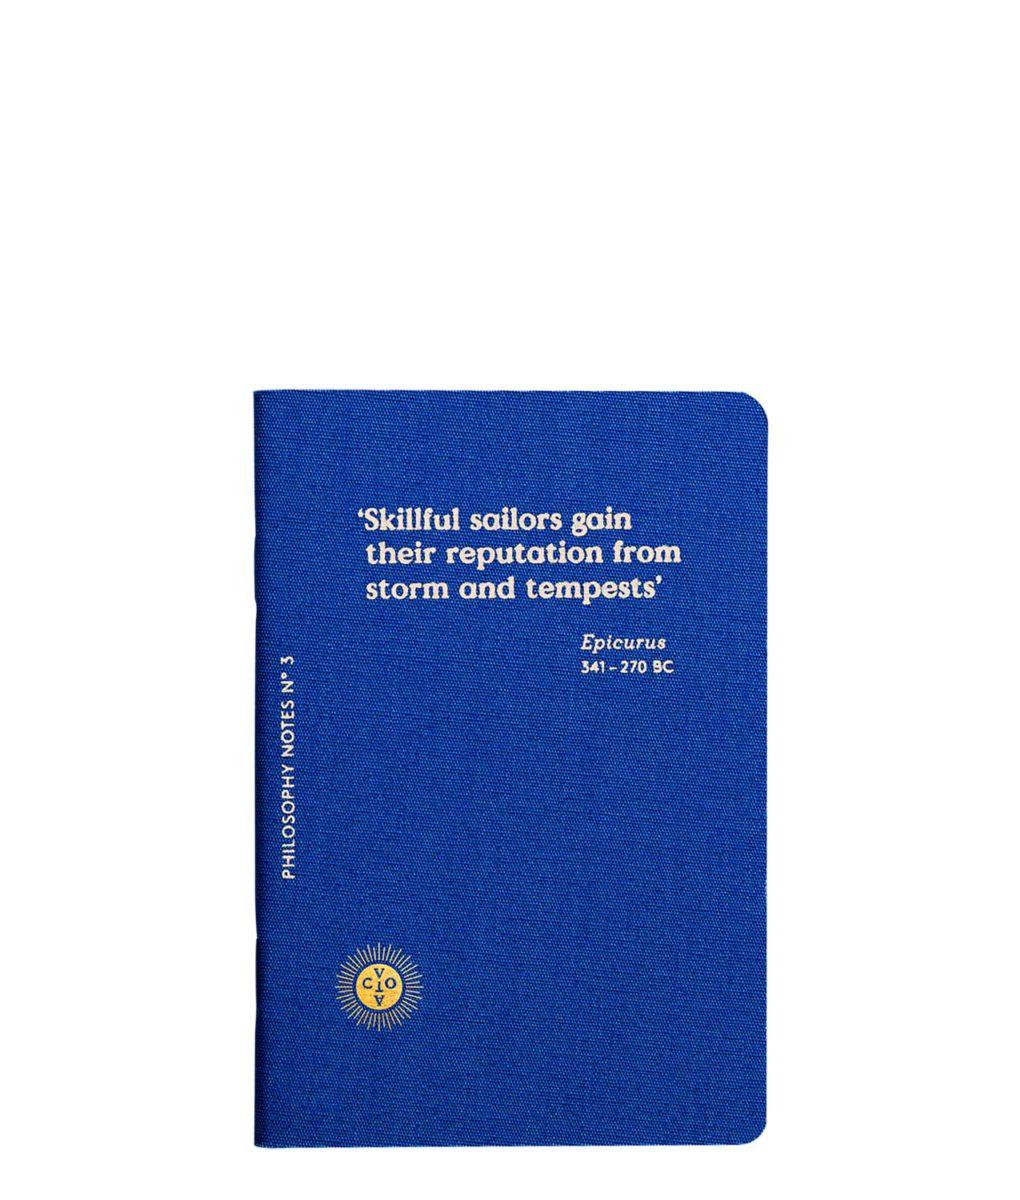 libreta-philosophy-azul-octaevo